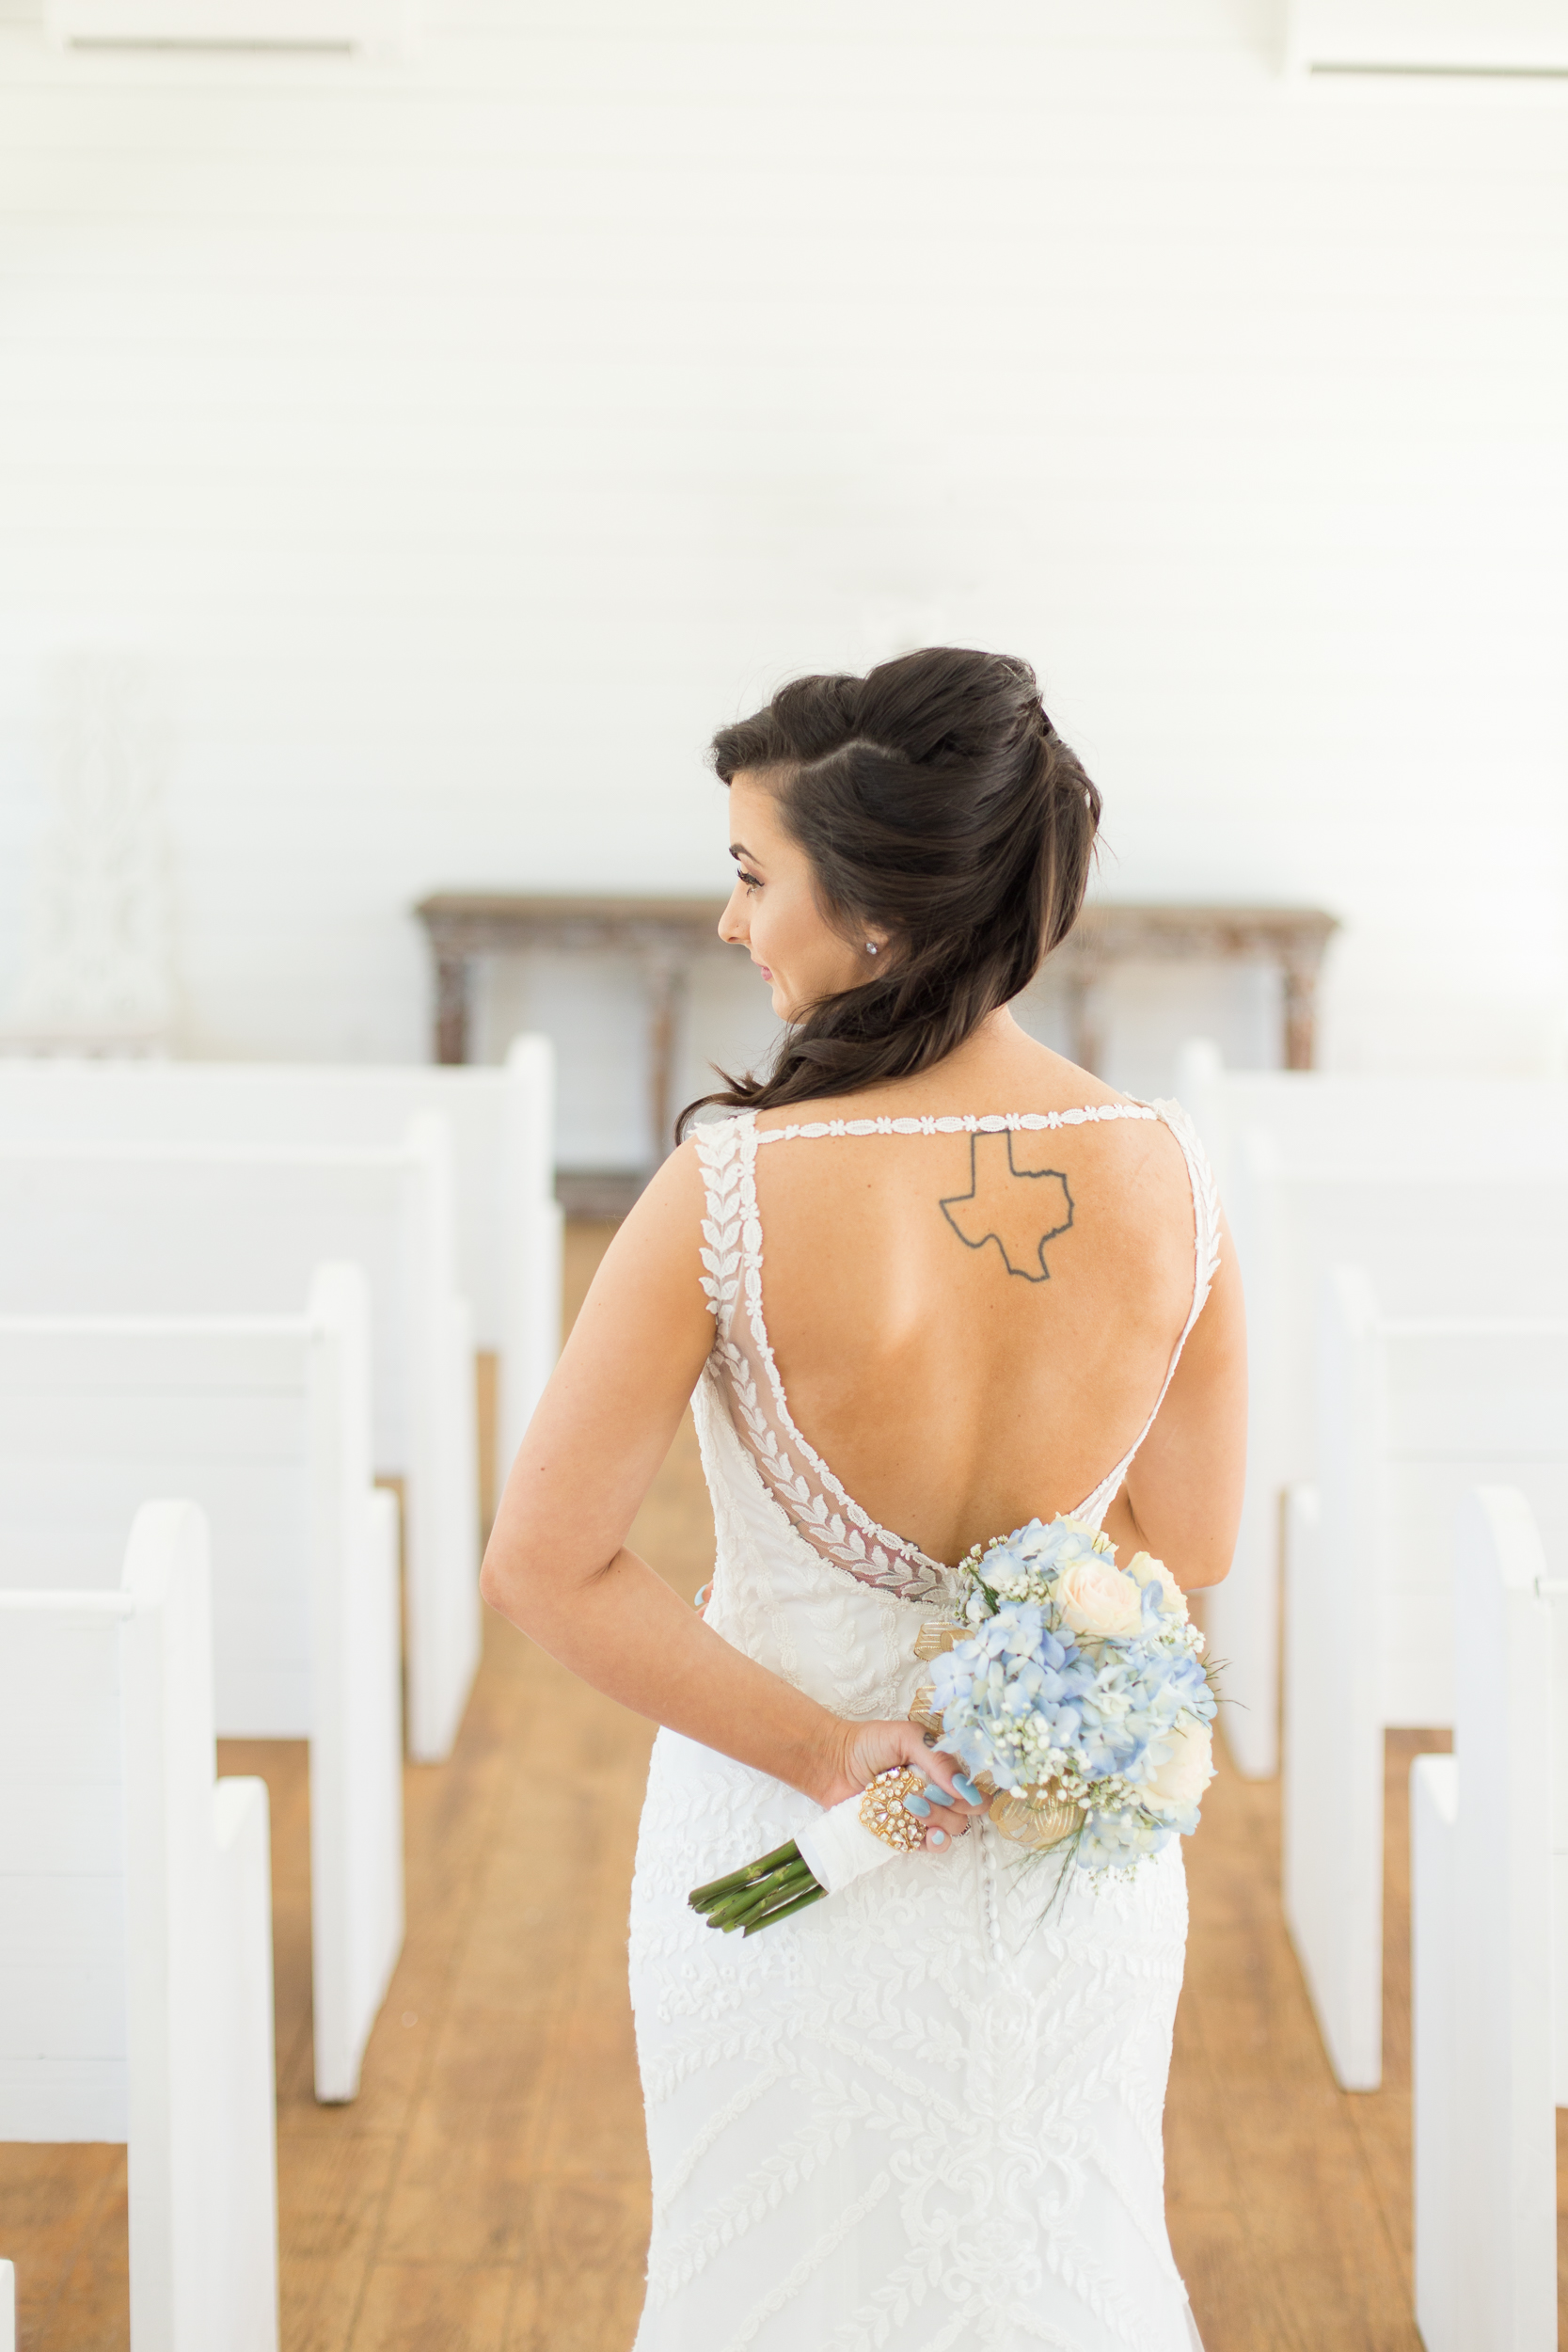 Zihlman-East TX Wedding_Kelsie Hendricks Photography_The Folmar Tyler Texas-78.jpg